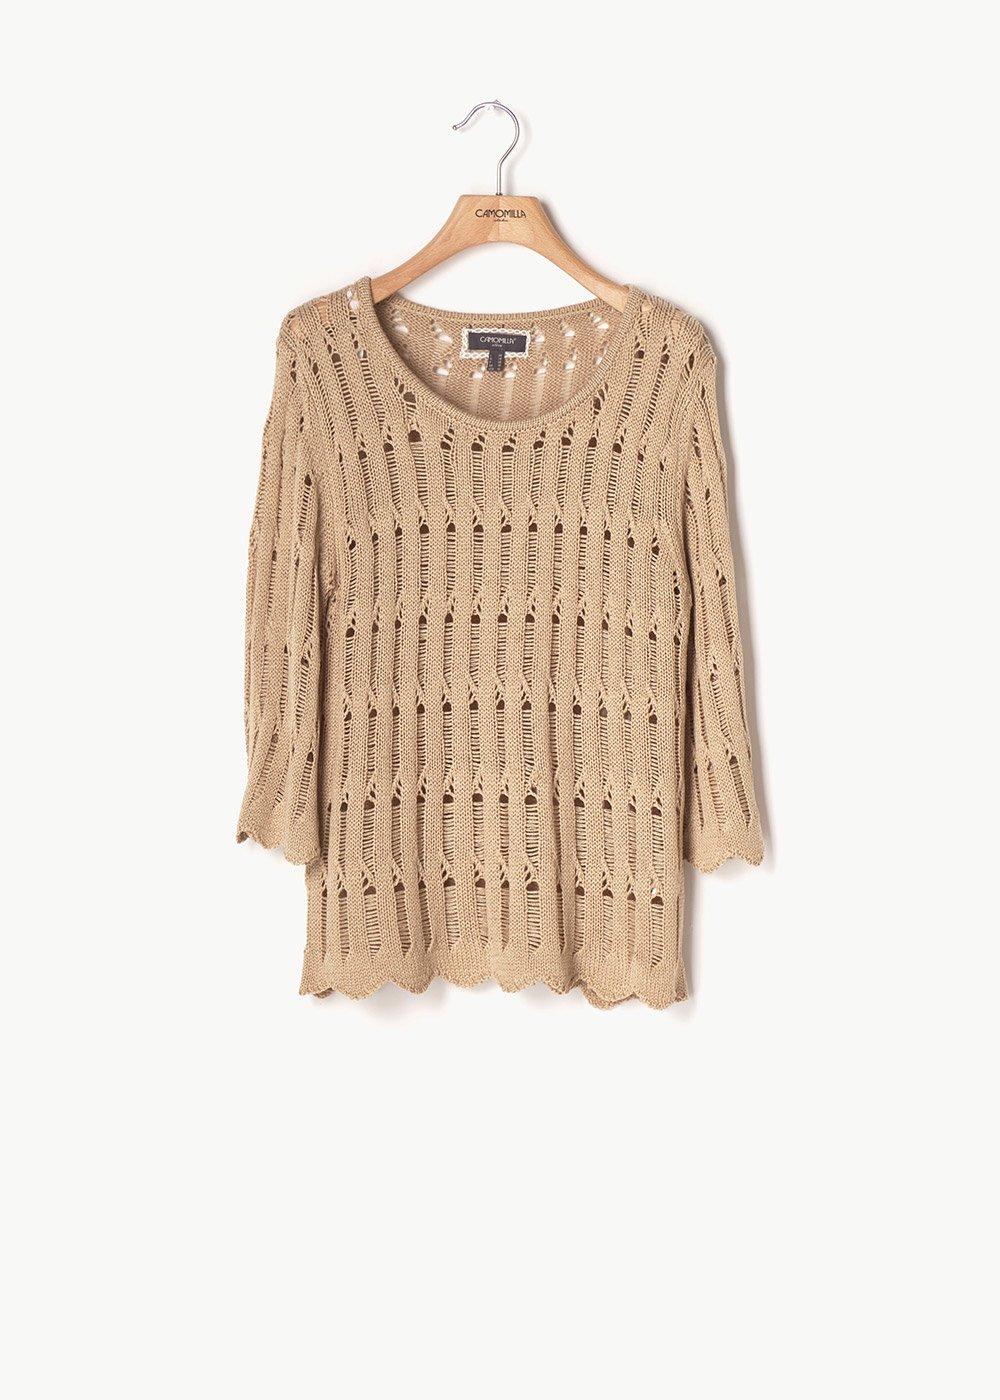 Doek openwork sweater - Doeskin - Woman